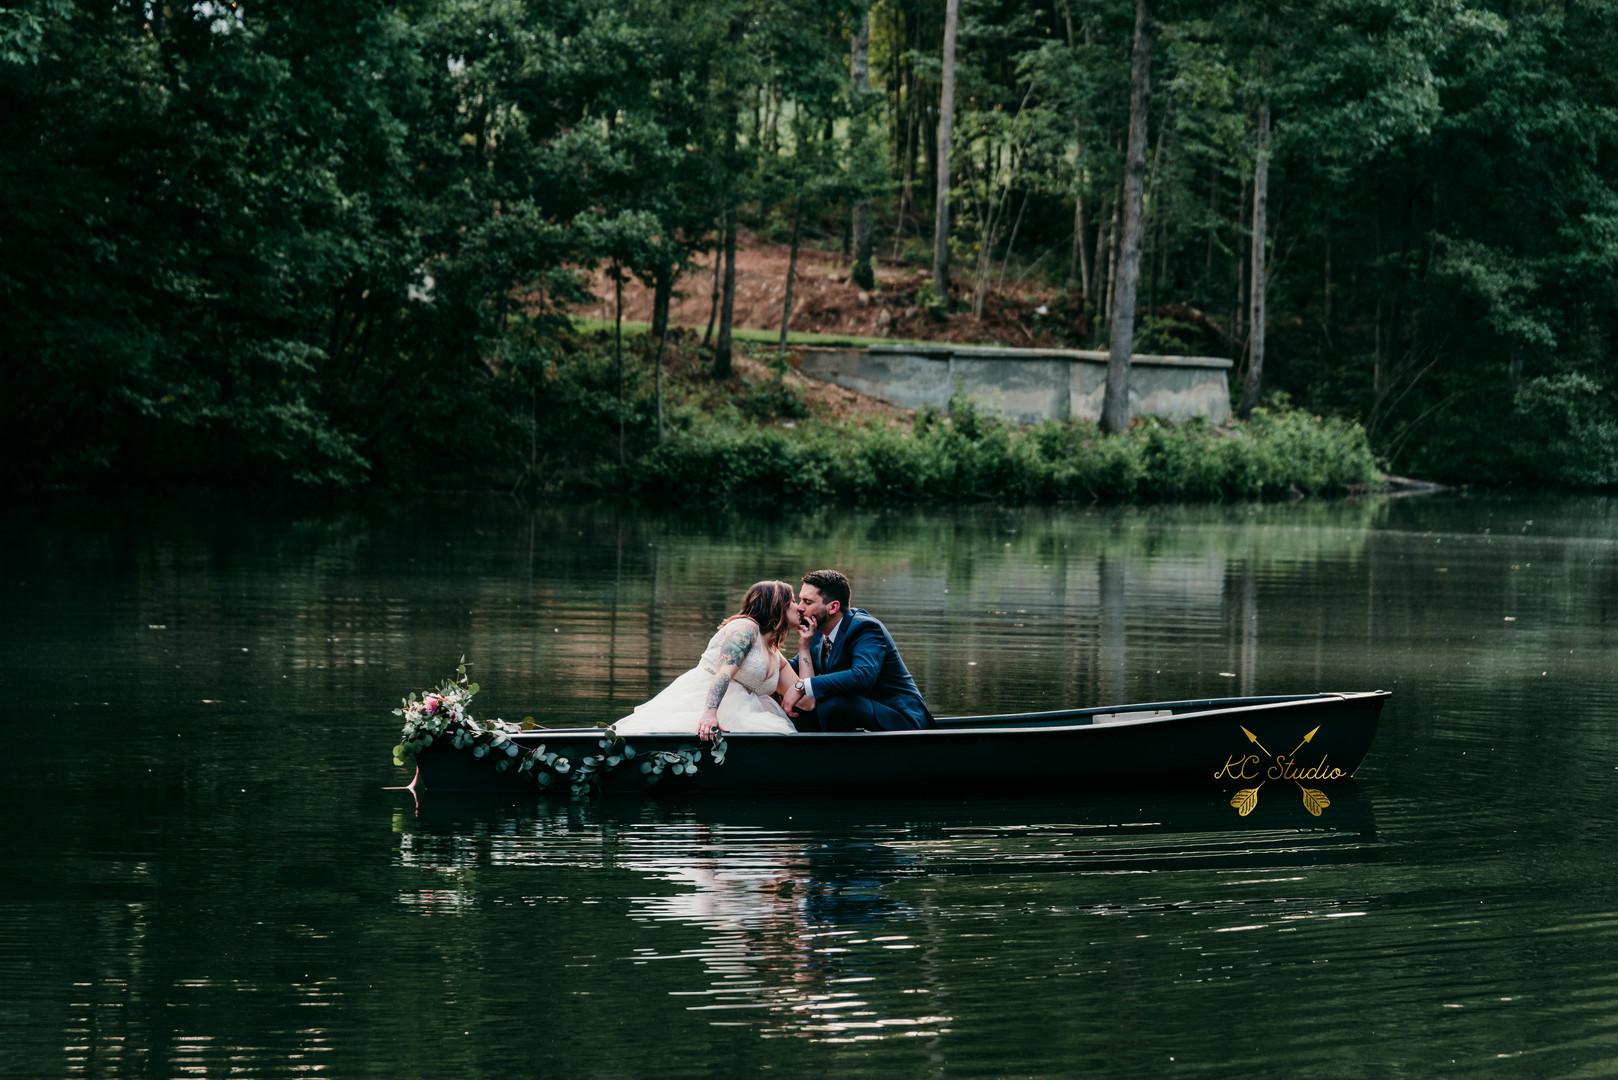 Bride & Groom in Canoe, Lake, Chateau Vi